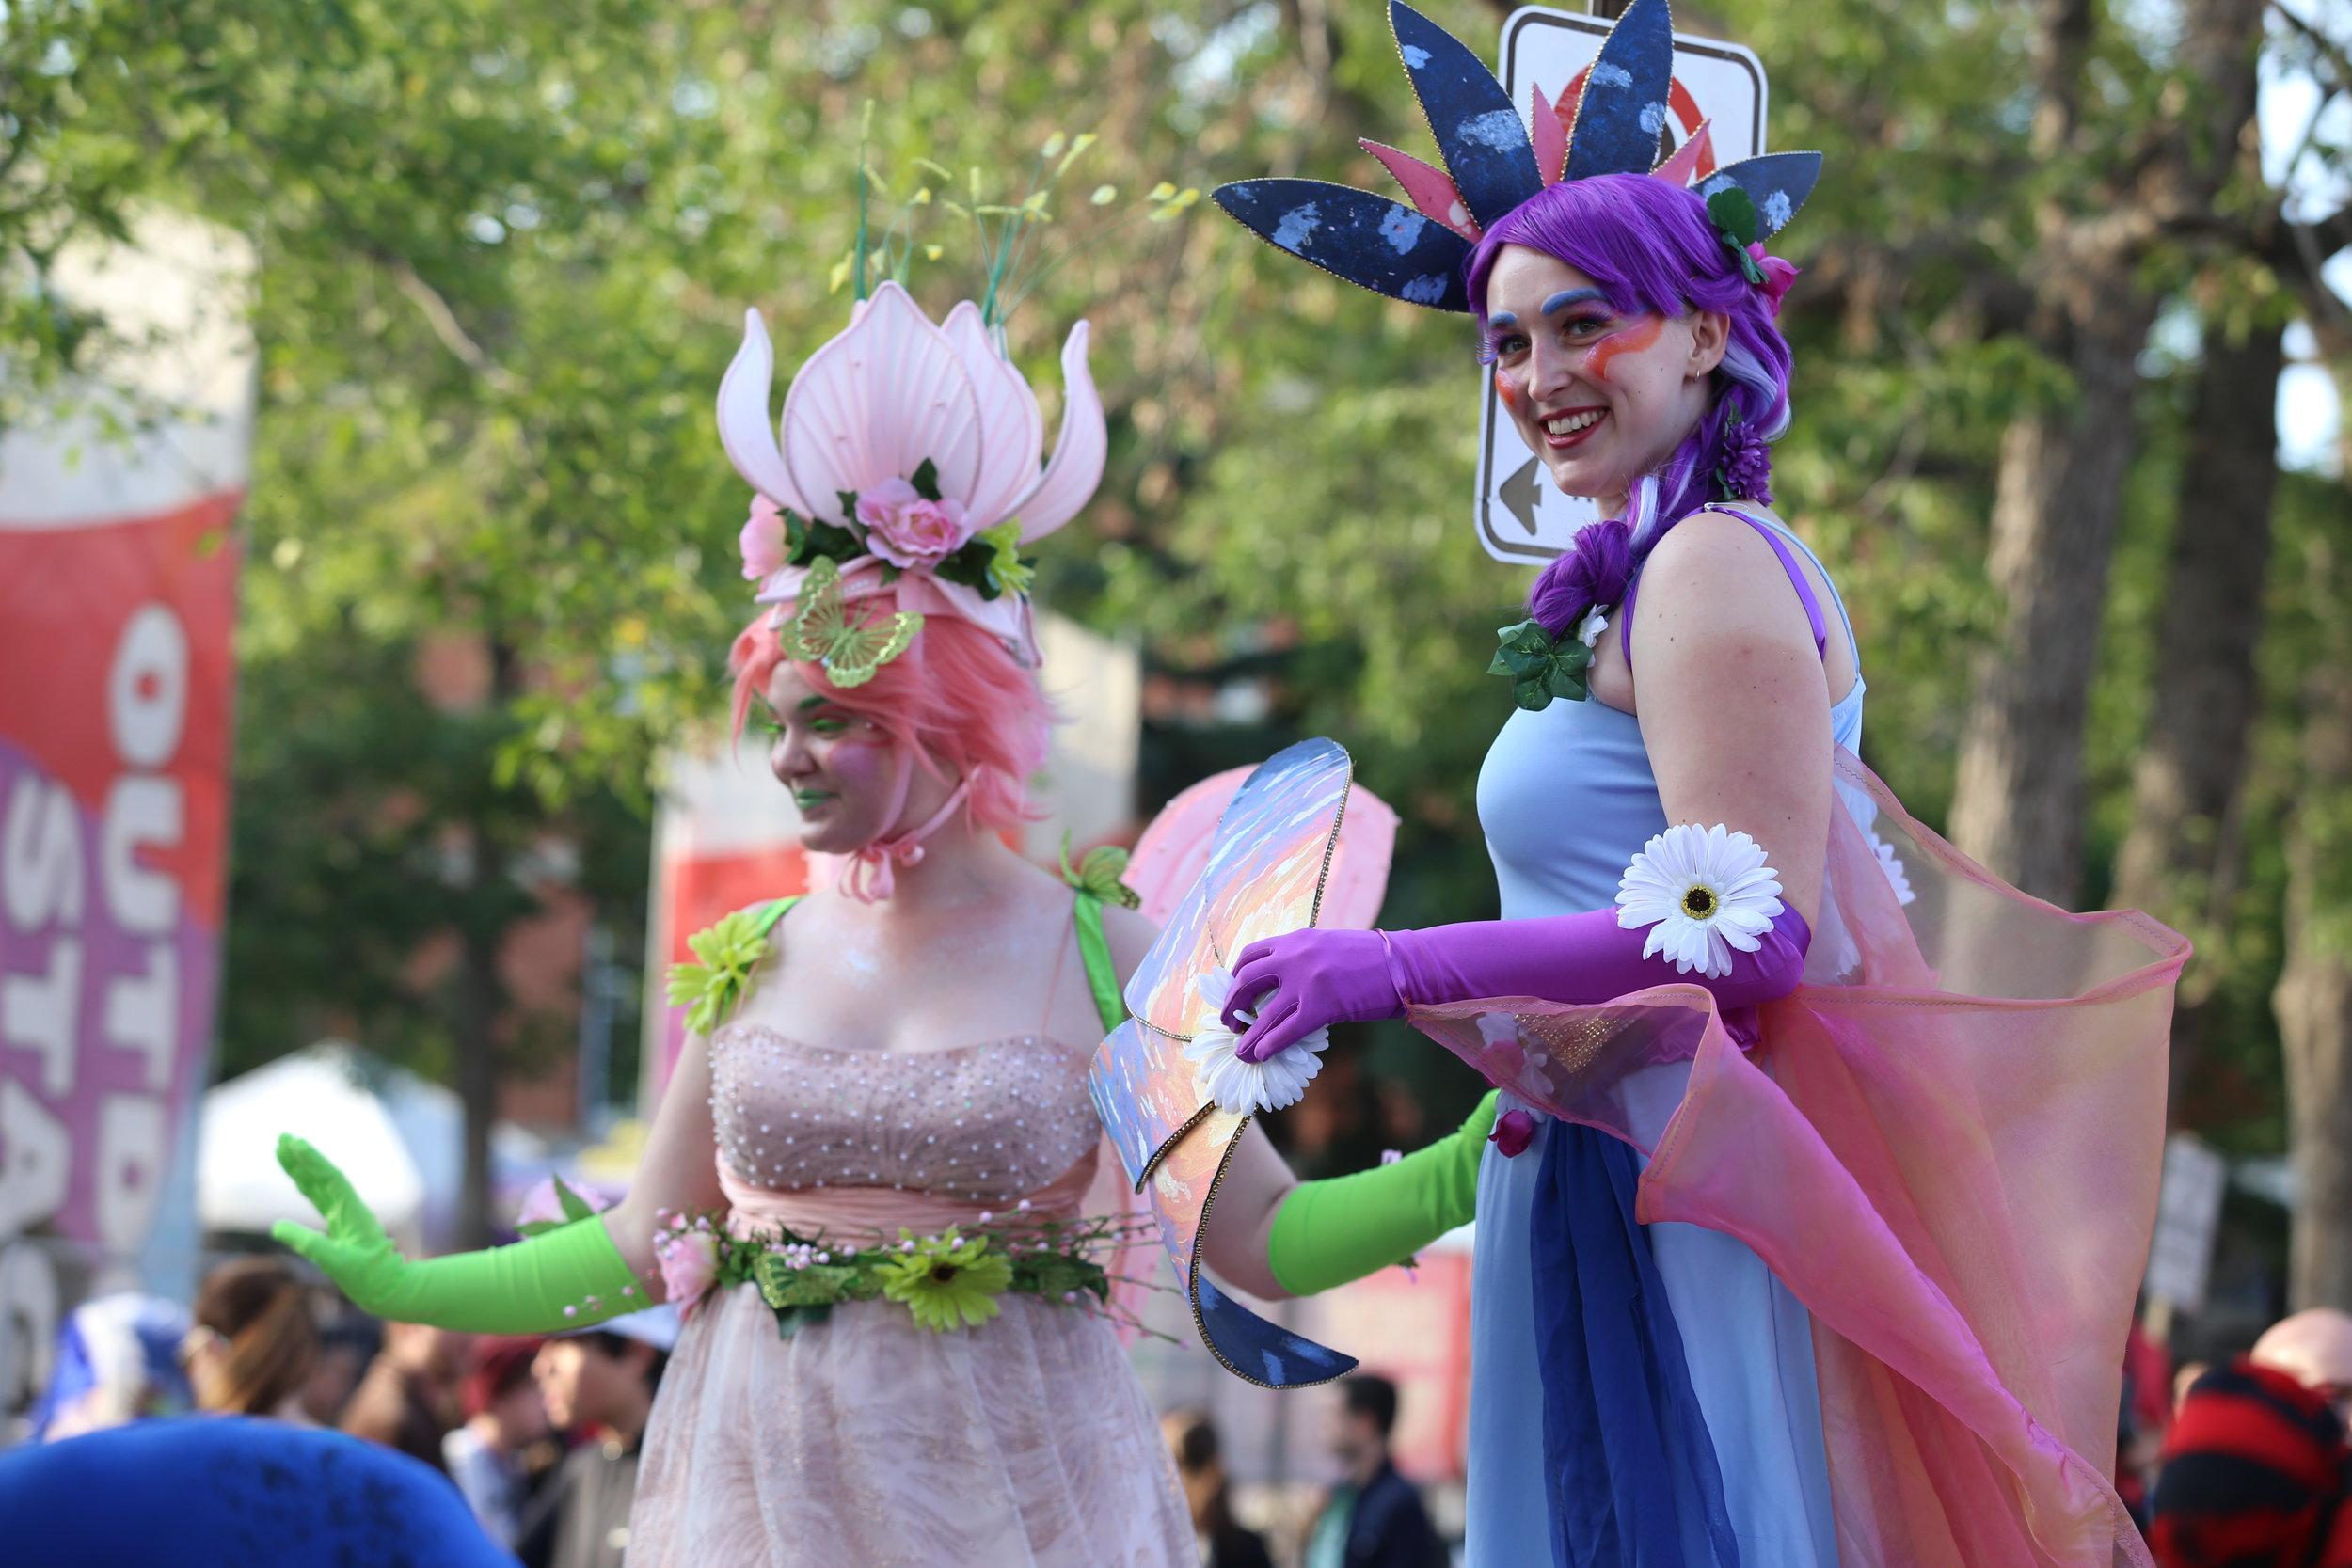 Spring and Summer Fairies - Edmonton Fringe Opening Ceremonies Photo by Nancy Price